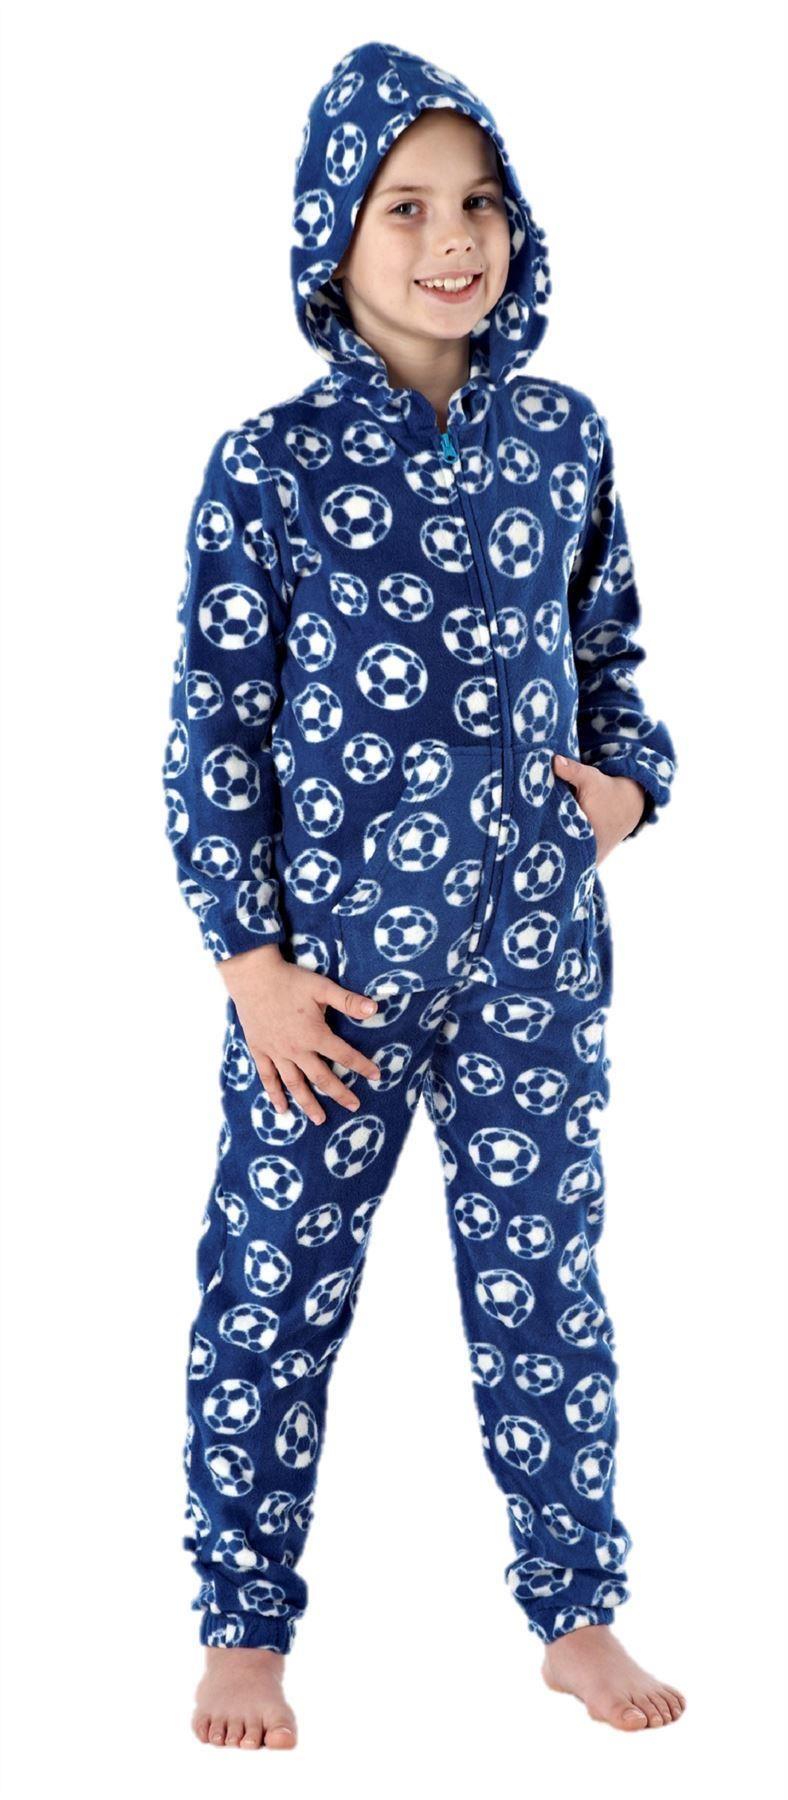 boys-all-in-one-sleepwear-pyjama-pajama-ones-one-piece-hoodie-FOOTBALL thumbnail 5